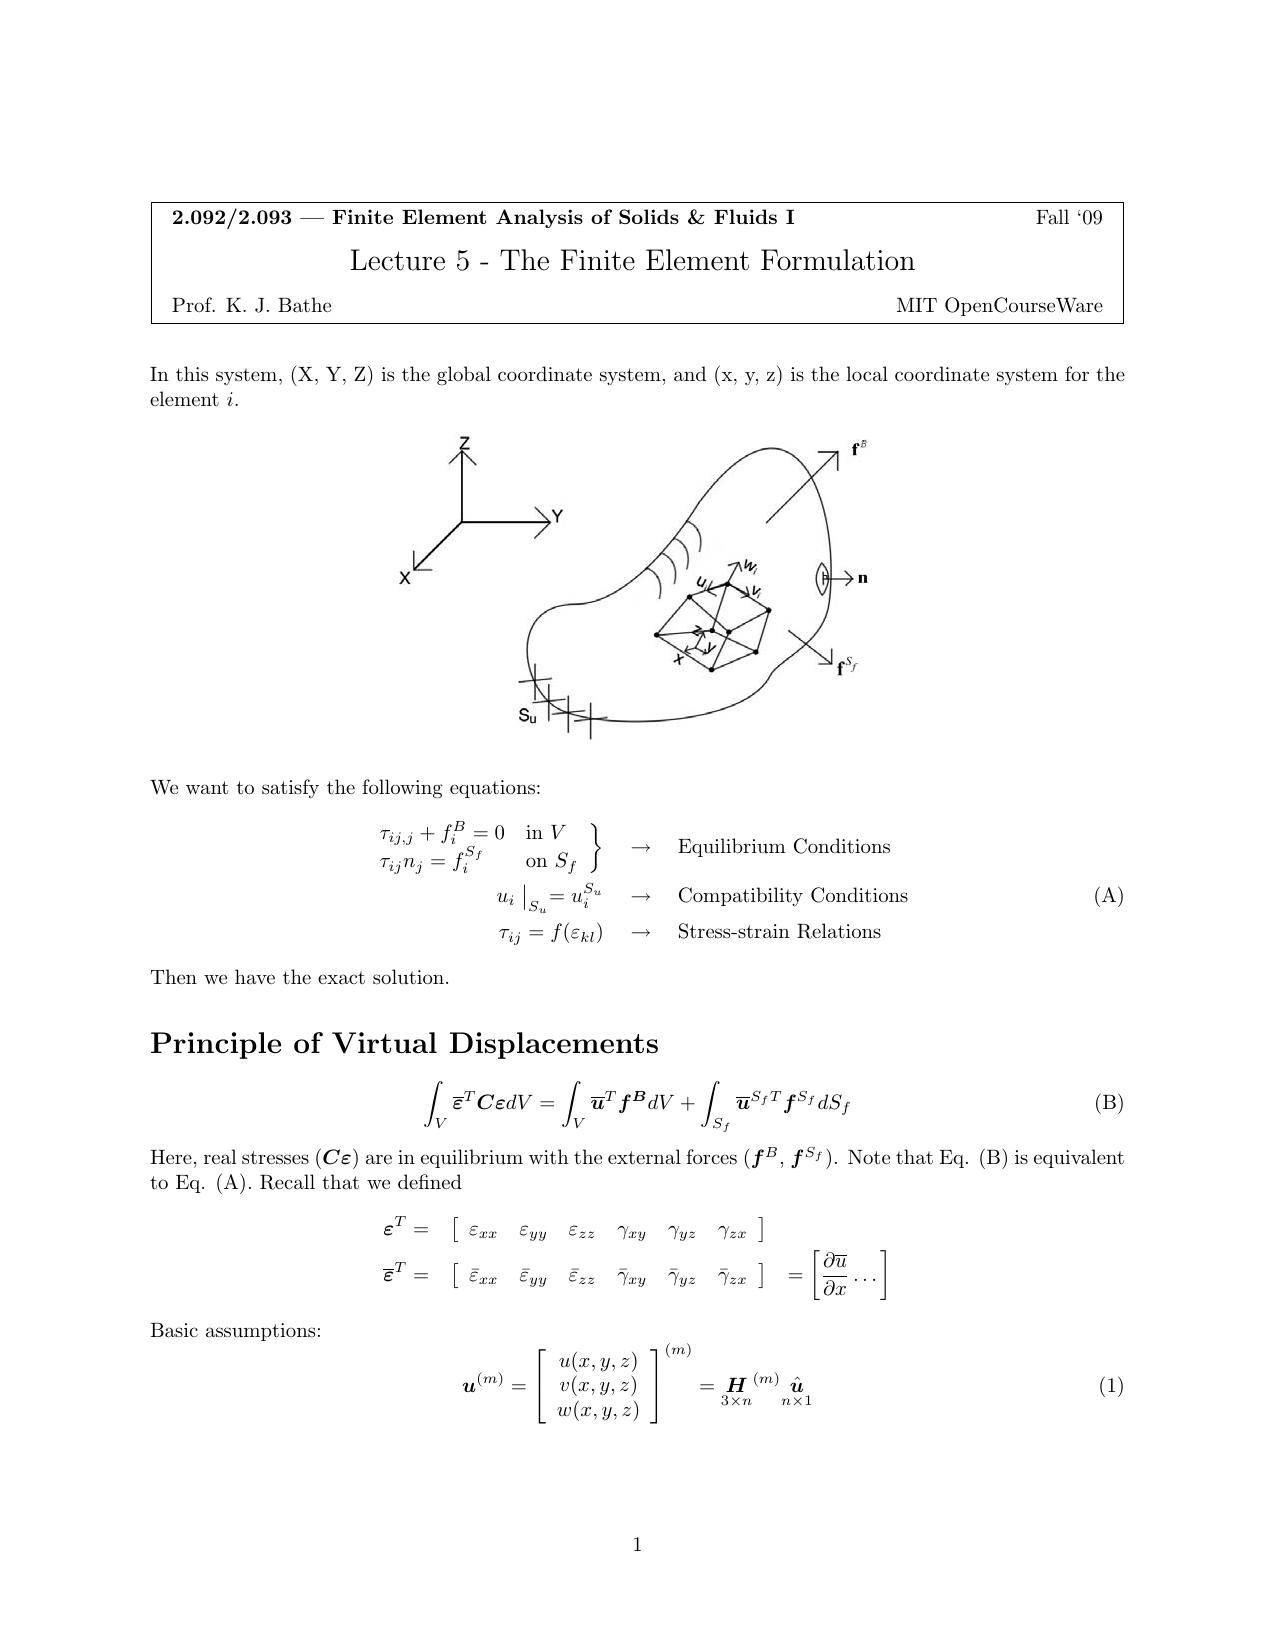 Lecture 5 - The Finite Element Formulation